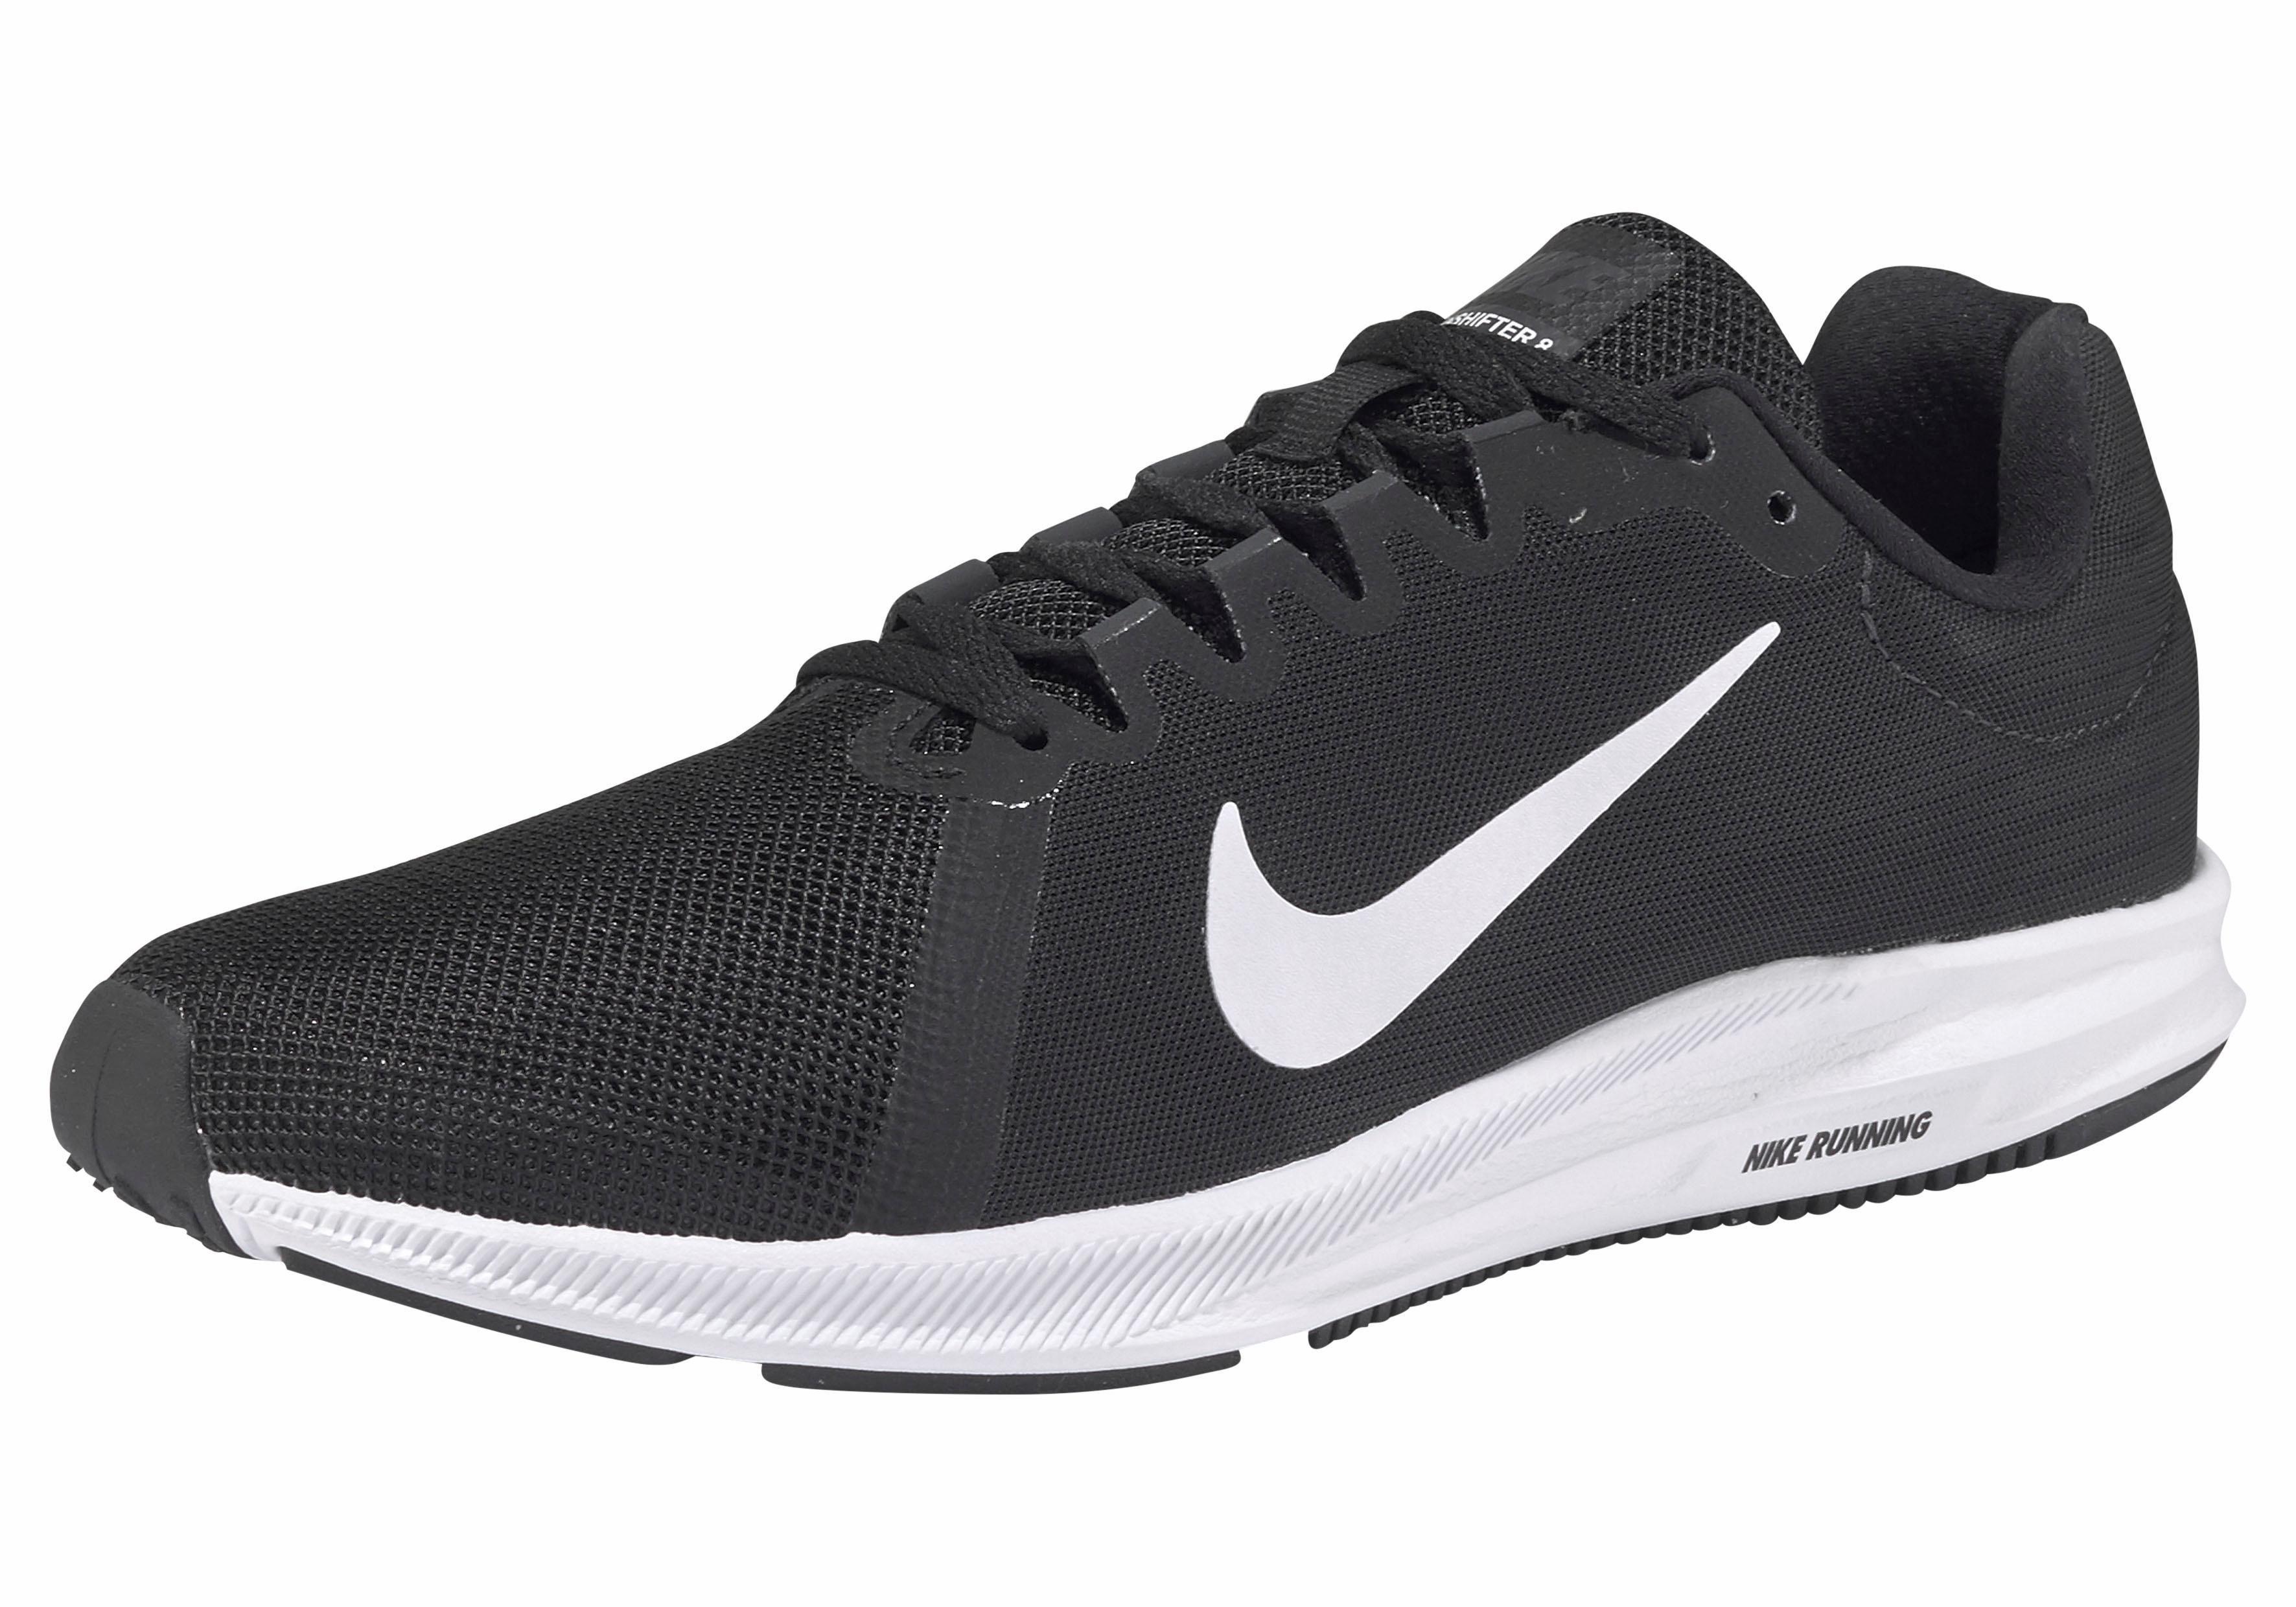 Nike runningschoenen »Downshifter 8« bestellen: 14 dagen bedenktijd